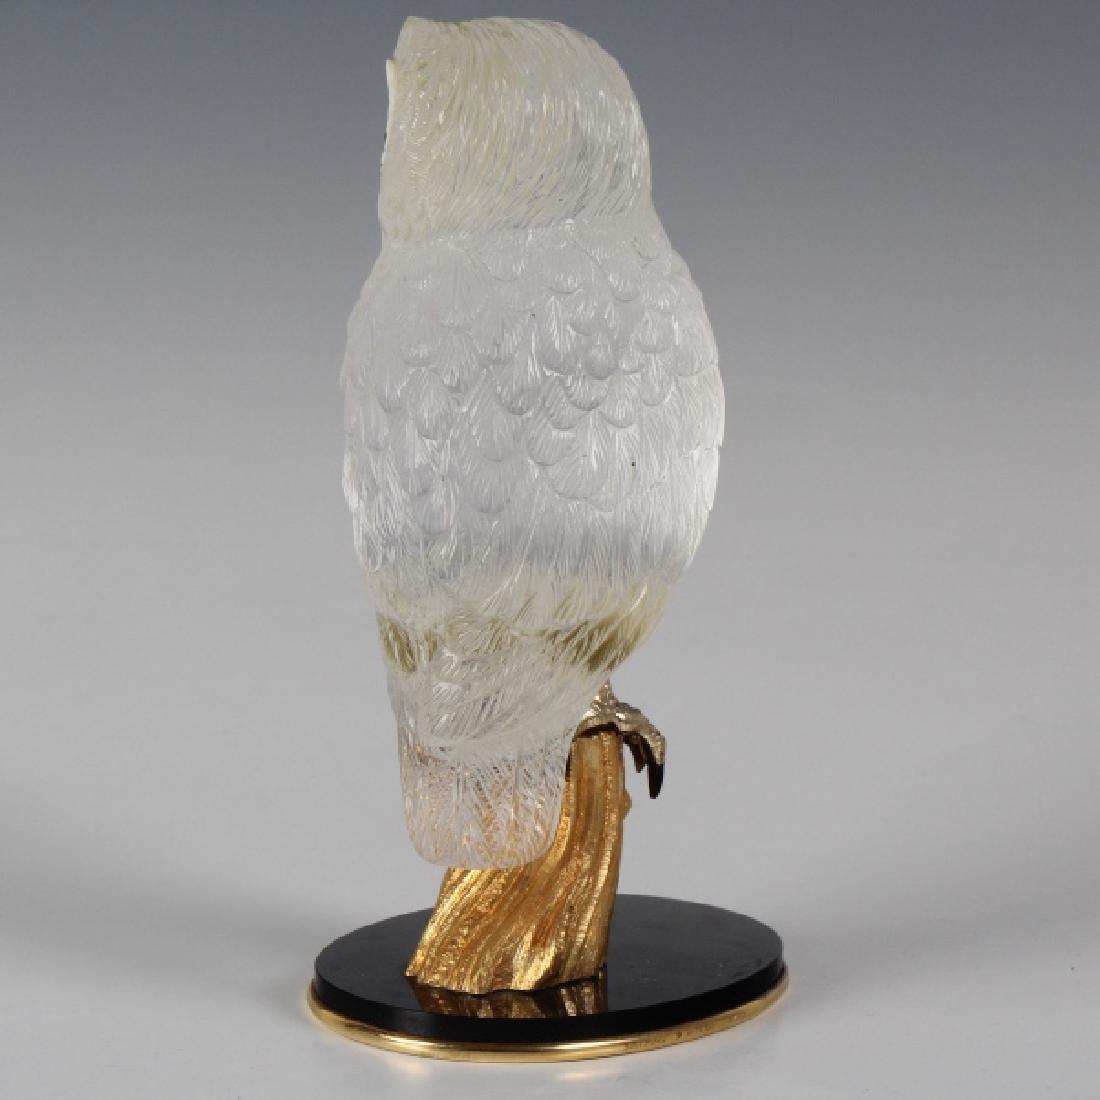 Important Boucheron Rock Crystal 18k Owl Statue - 6